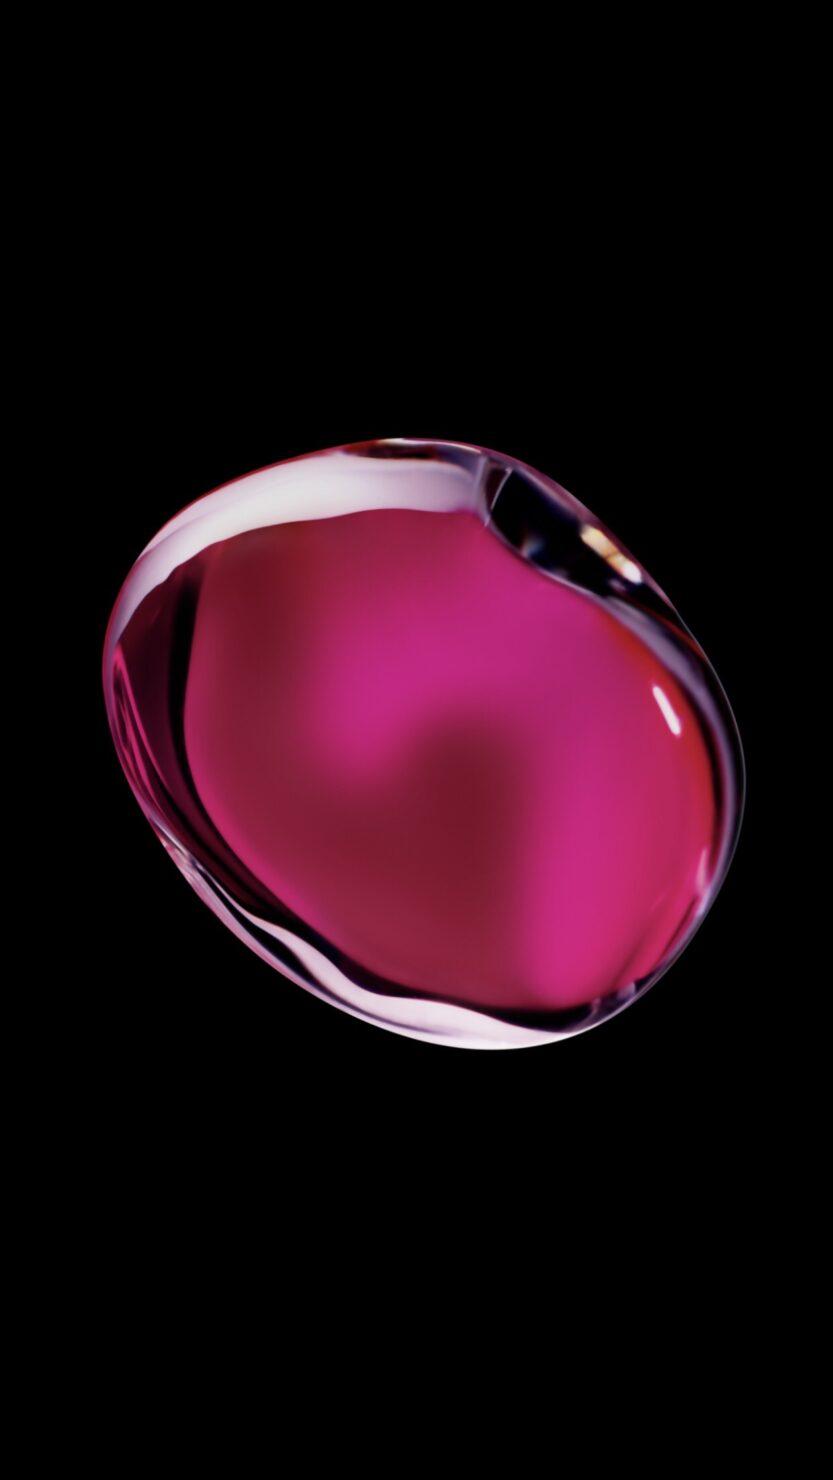 iphone-7-wallpaper-pink